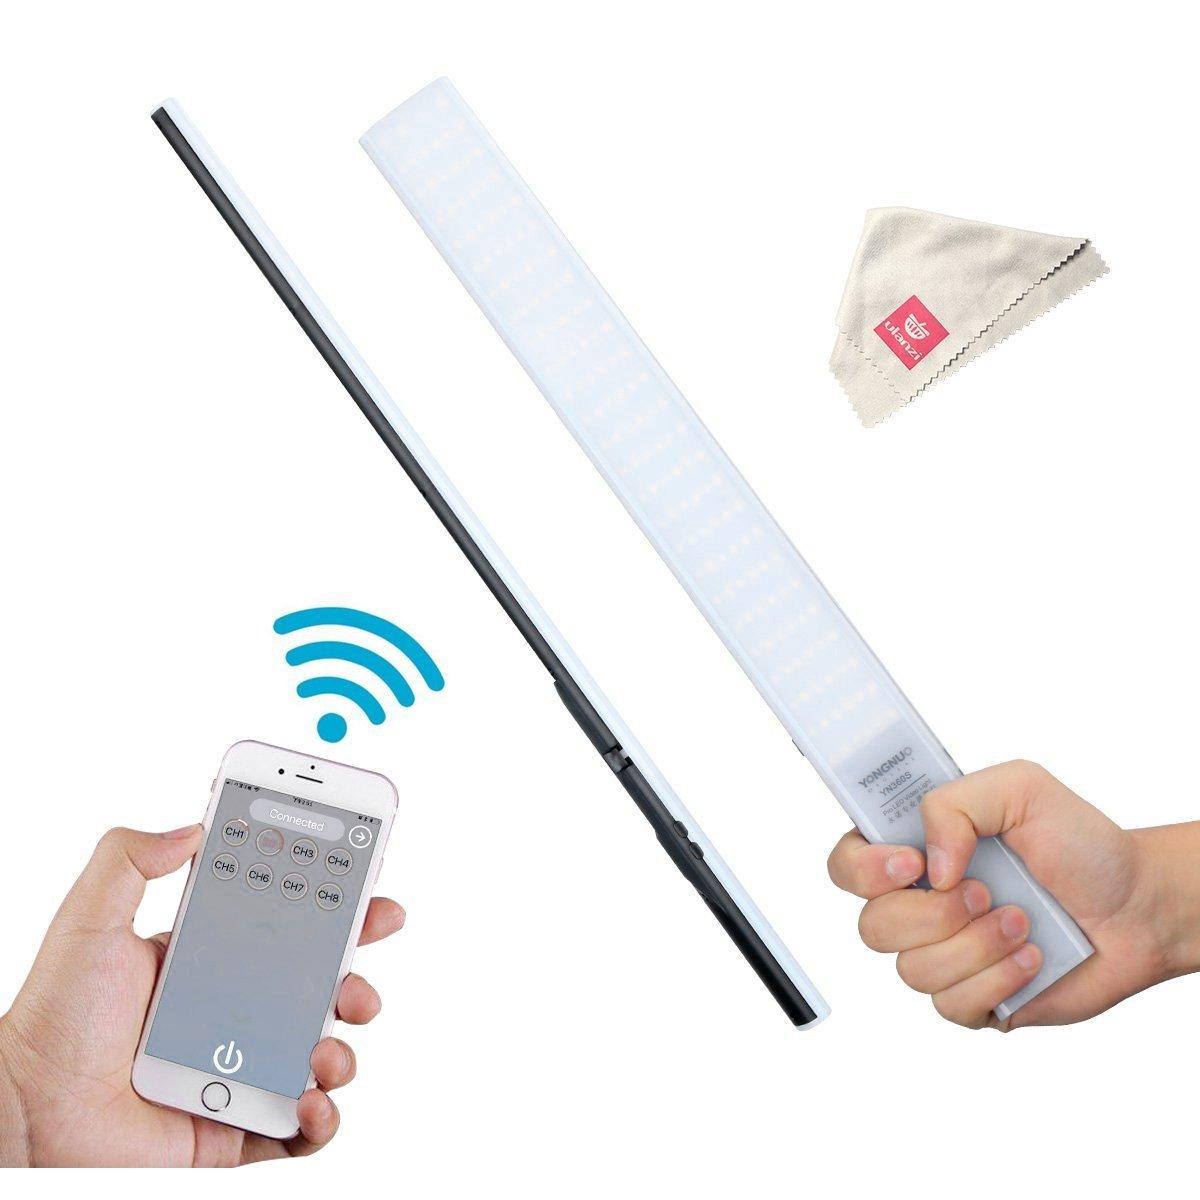 Yongnuo YN360S Ultra-thin,Ultra-light Handheld Ice Stick LED Video Light 3200k to 5500k Controlled by Phone App Fill Light Stick